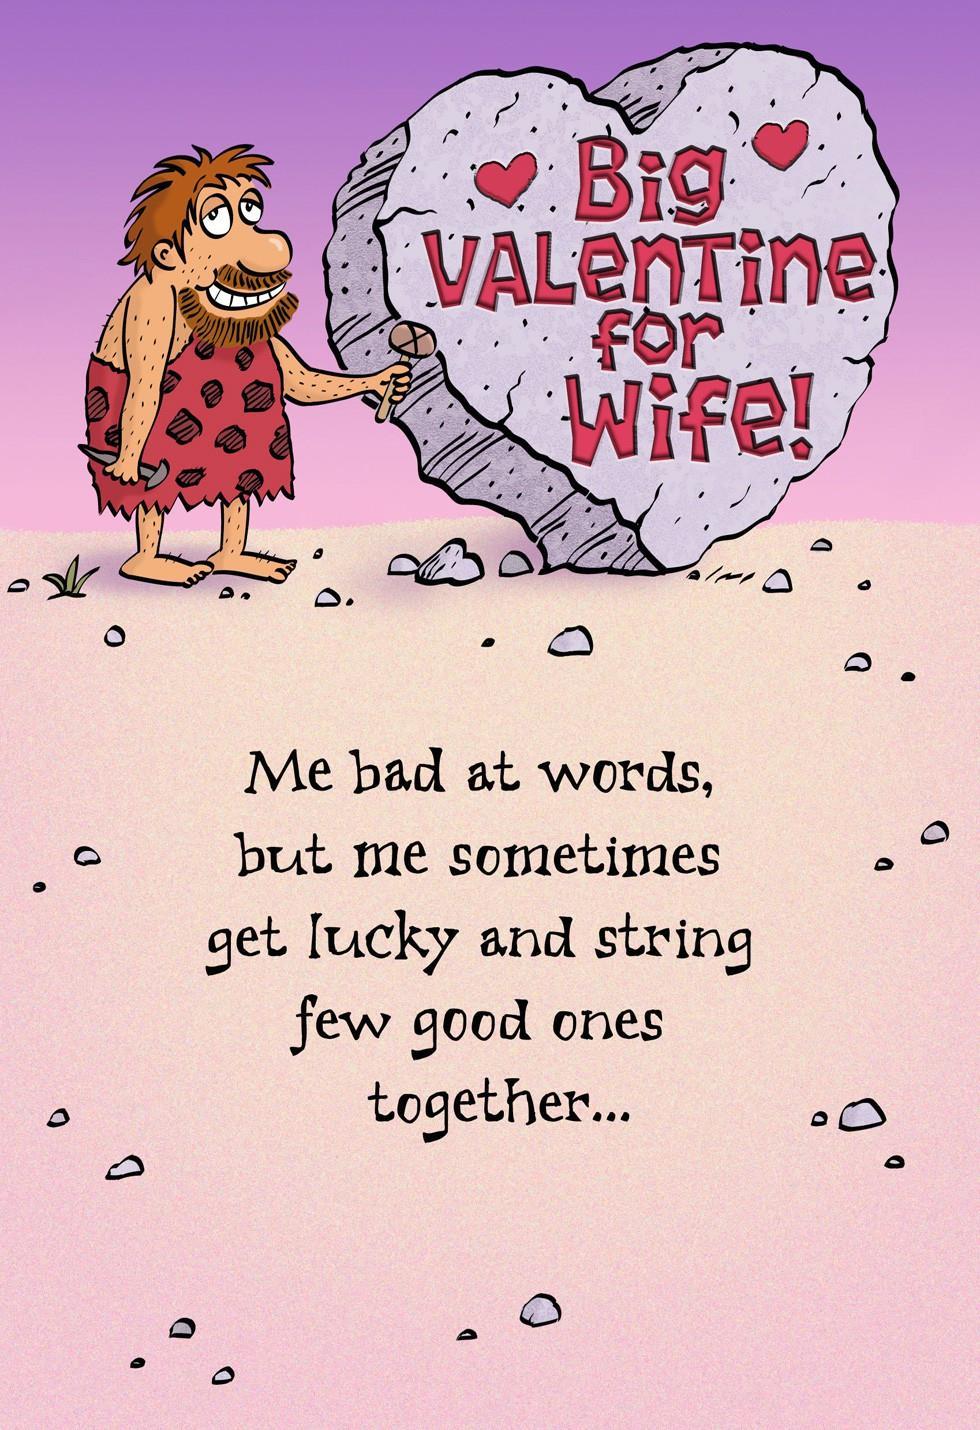 Doc500500 Big Valentine Card Amazon 2x3 Giant Valentines Day – Valentine Day Cards for Wife